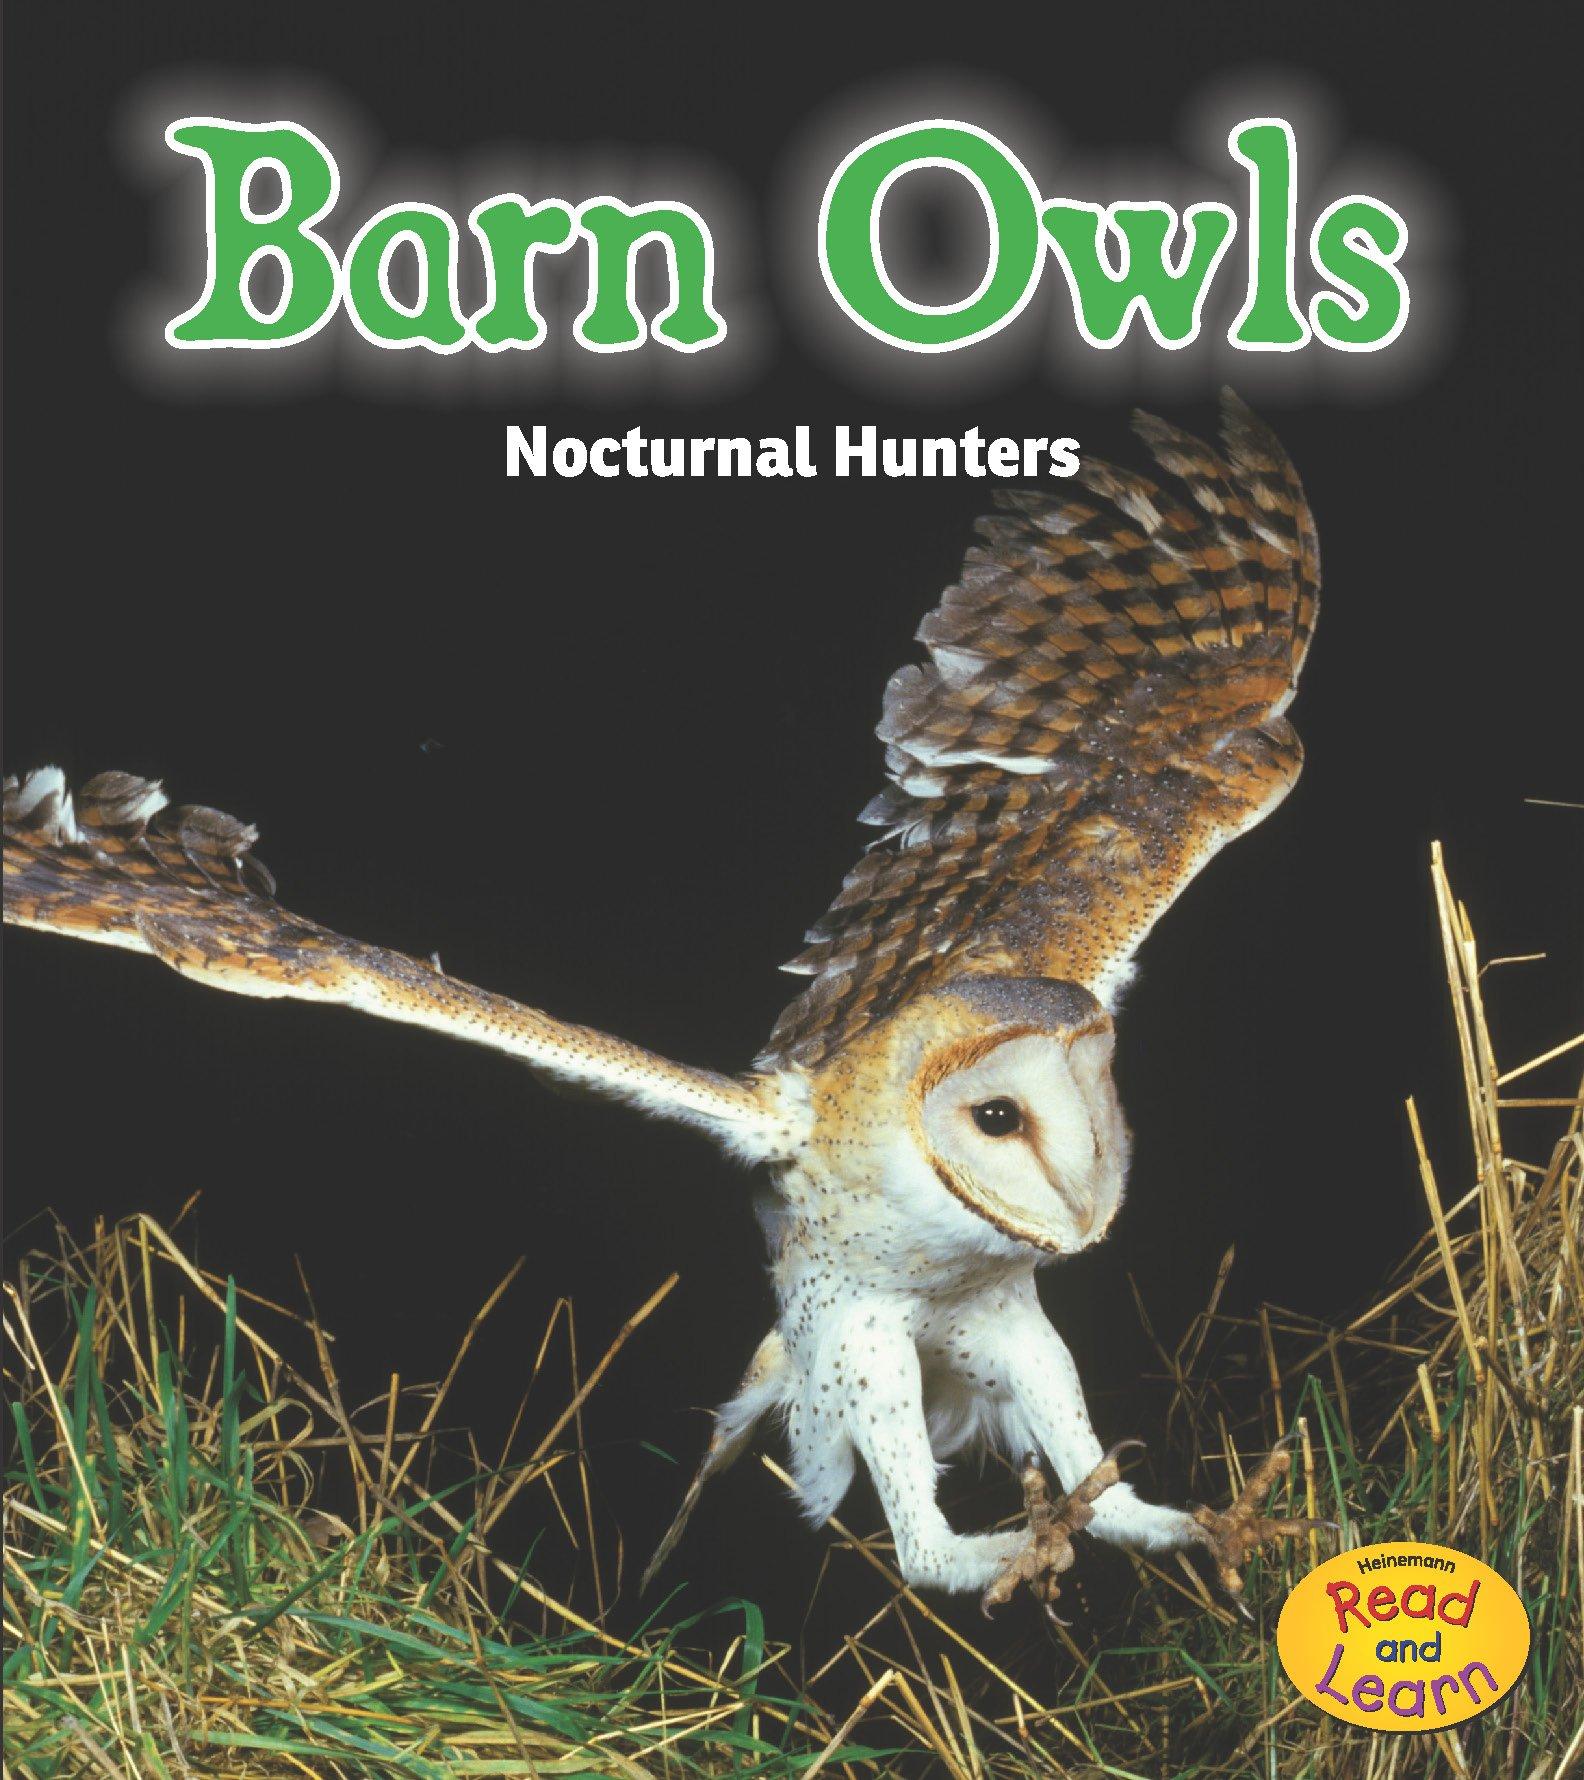 Eagle Owl Follow The Author Amazoncom Amazoncom Barn Owls Nocturnal Hunters night Safari